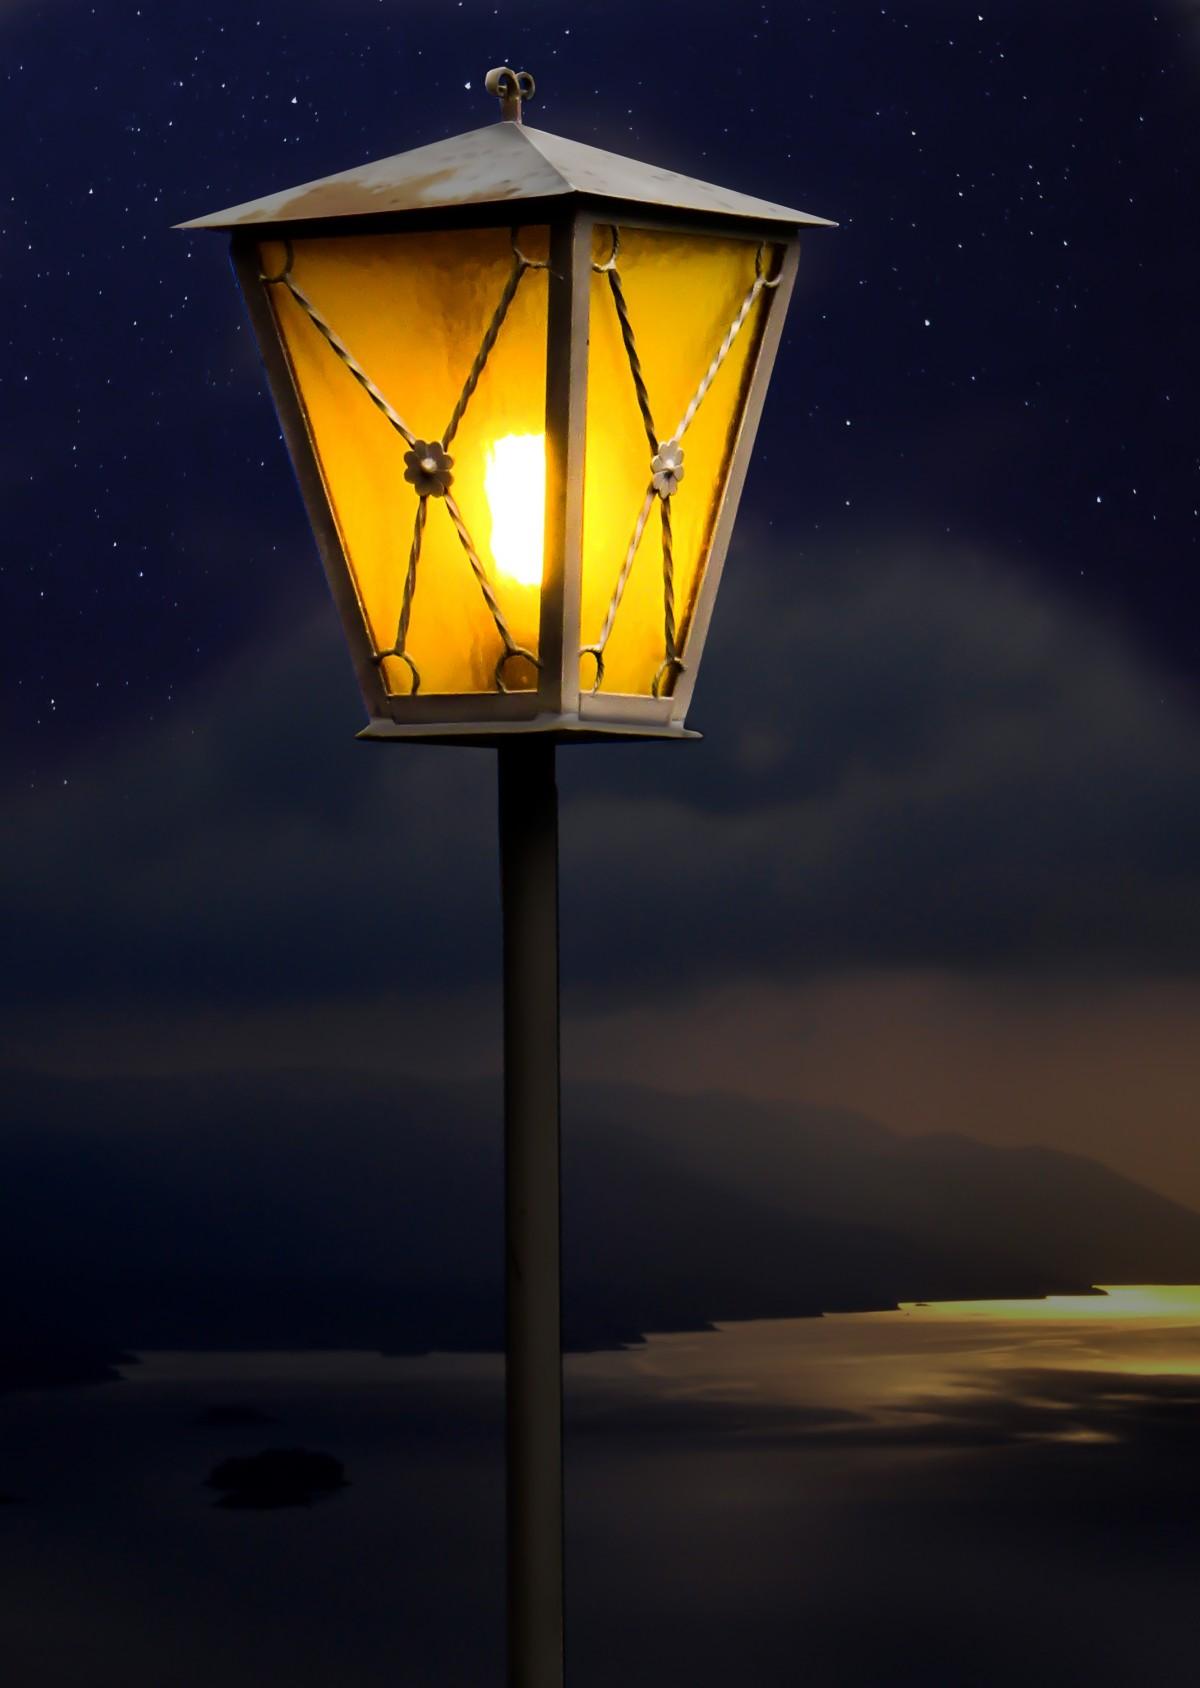 free images night antique star evening lantern. Black Bedroom Furniture Sets. Home Design Ideas